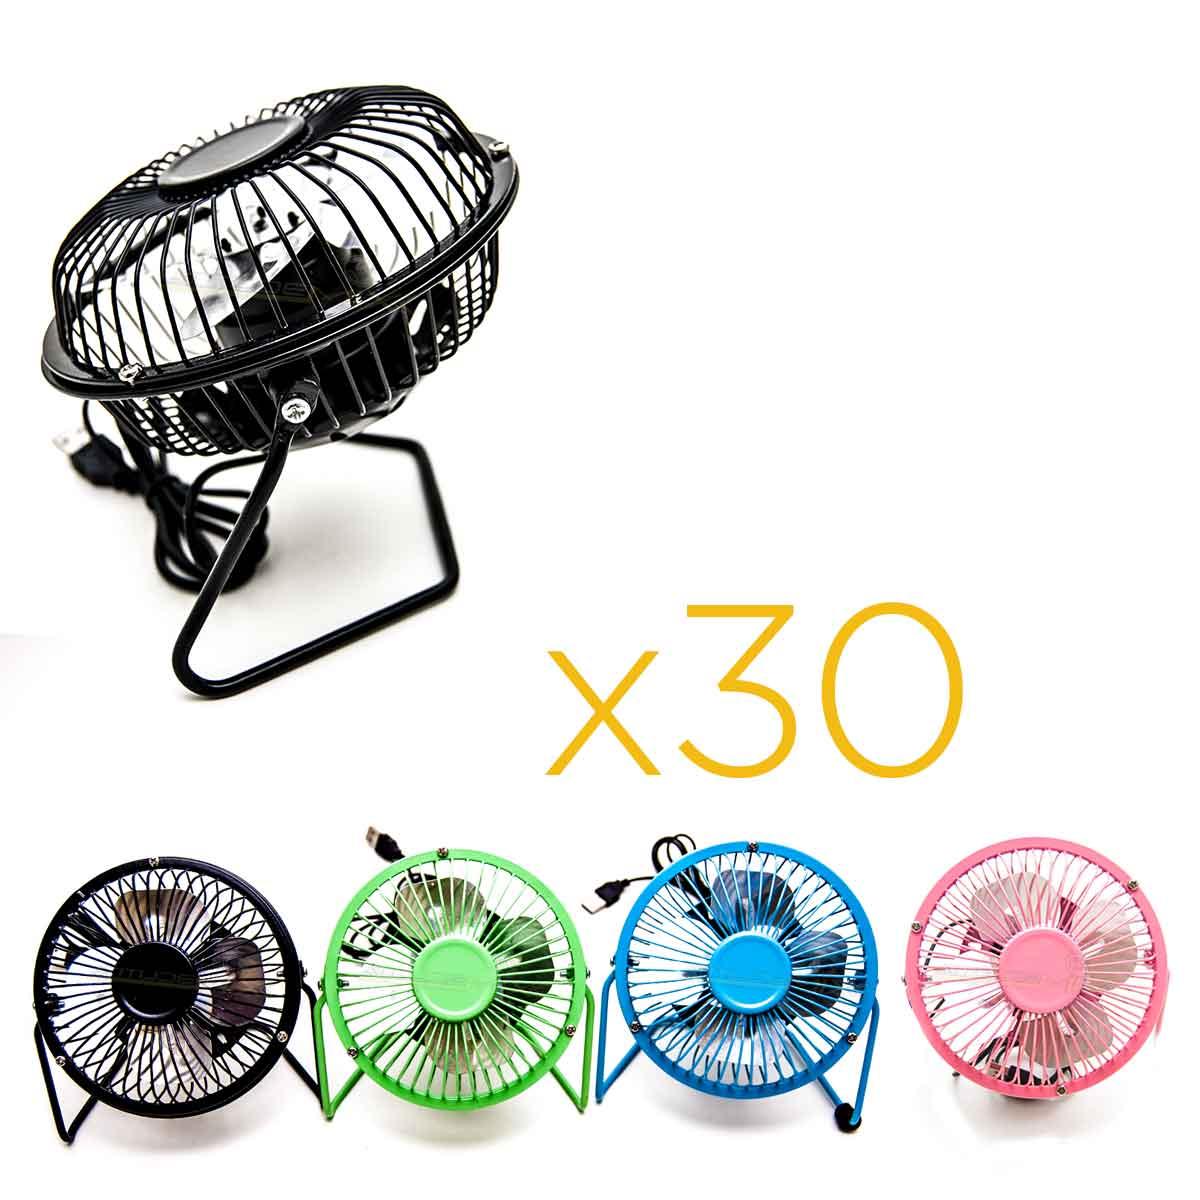 Kit 30 Mini Ventiladores Usb De Mesa Portátil Silencioso